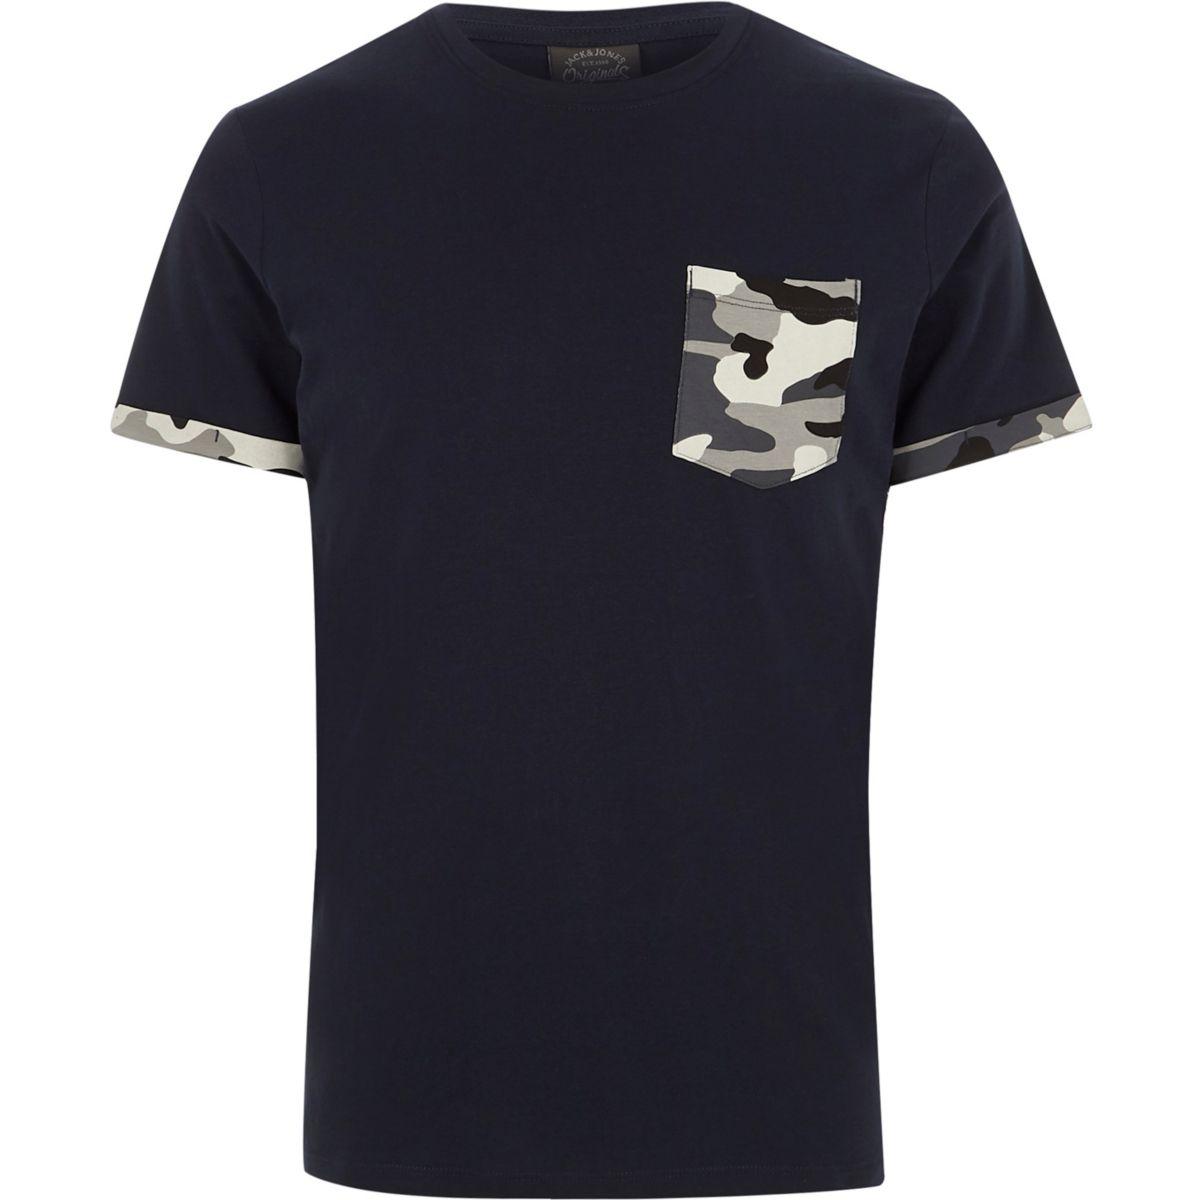 Navy Jack & Jones camo pocket T-shirt